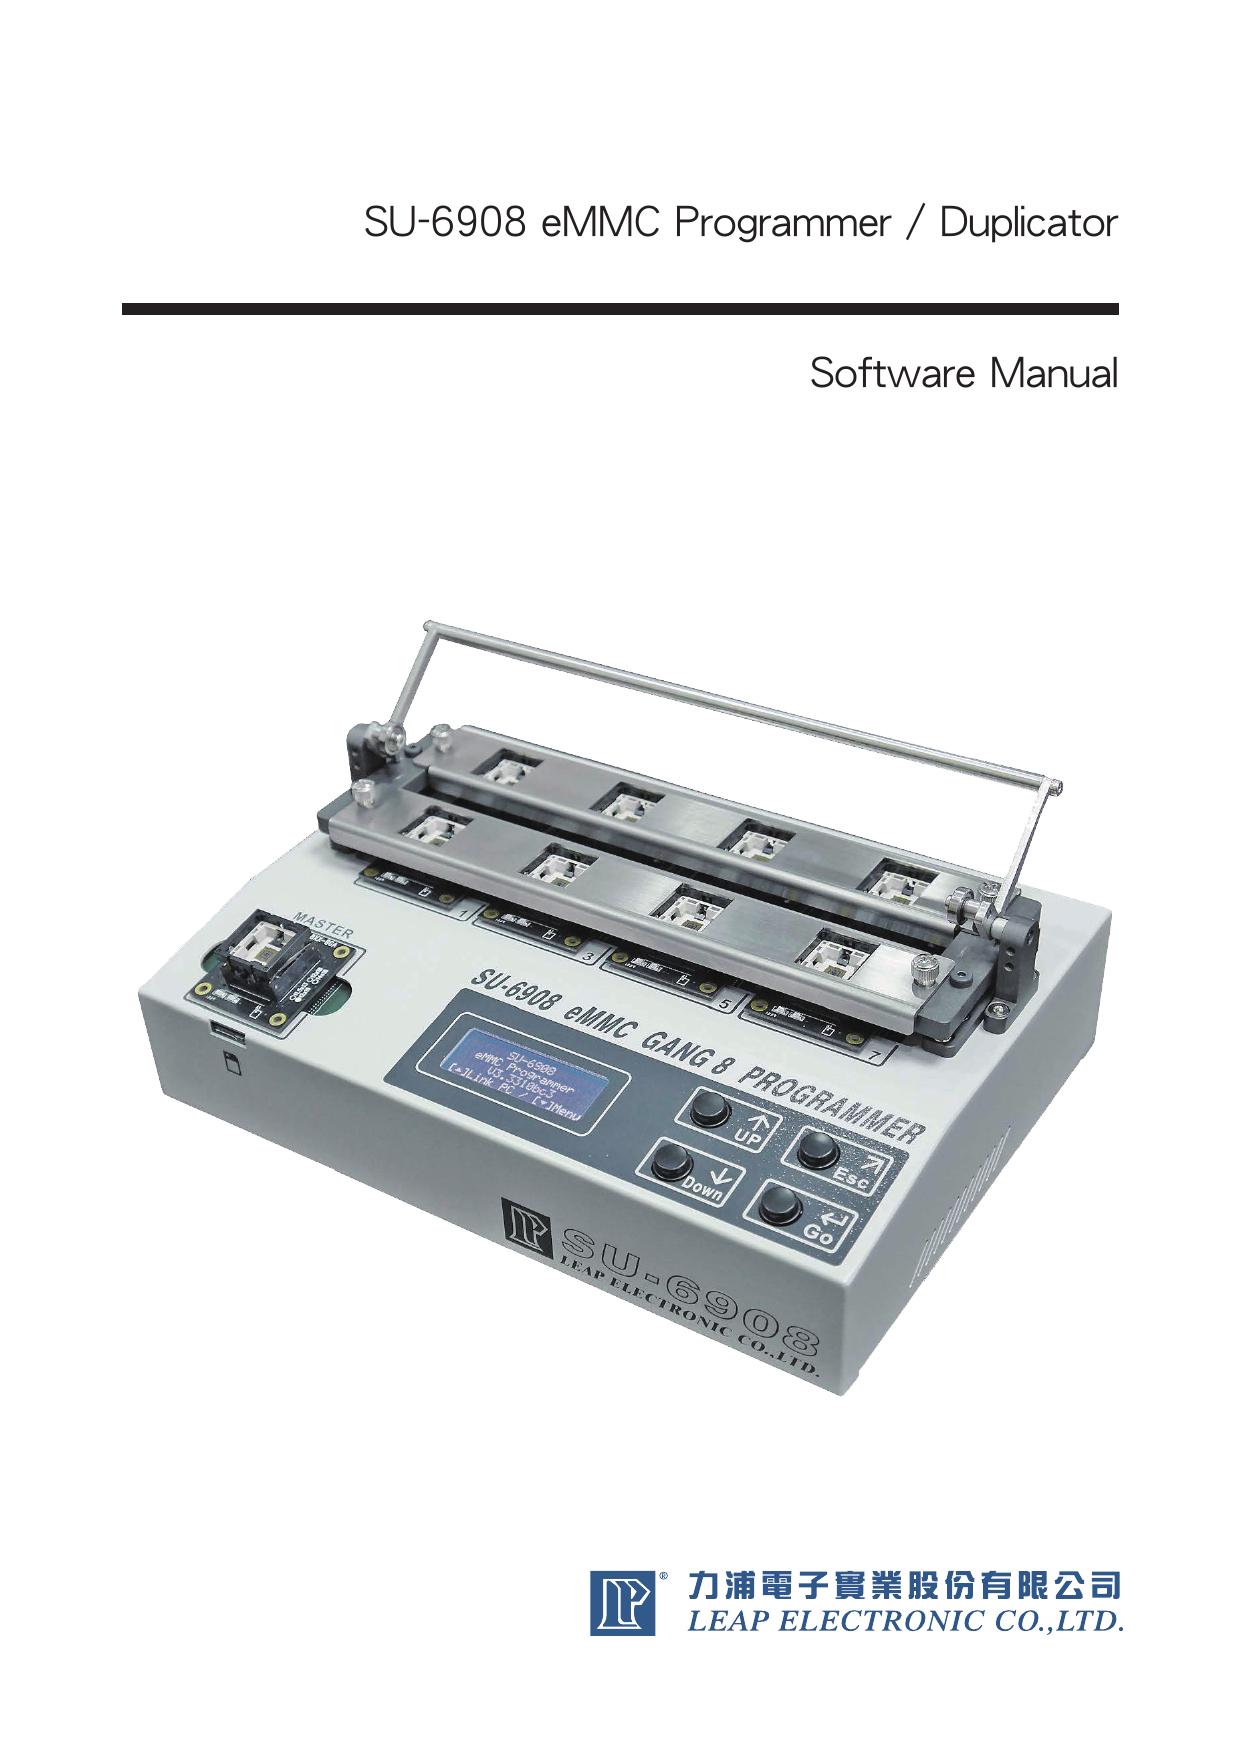 SU-6908 eMMC Programmer / Duplicator Software Manual | manualzz com